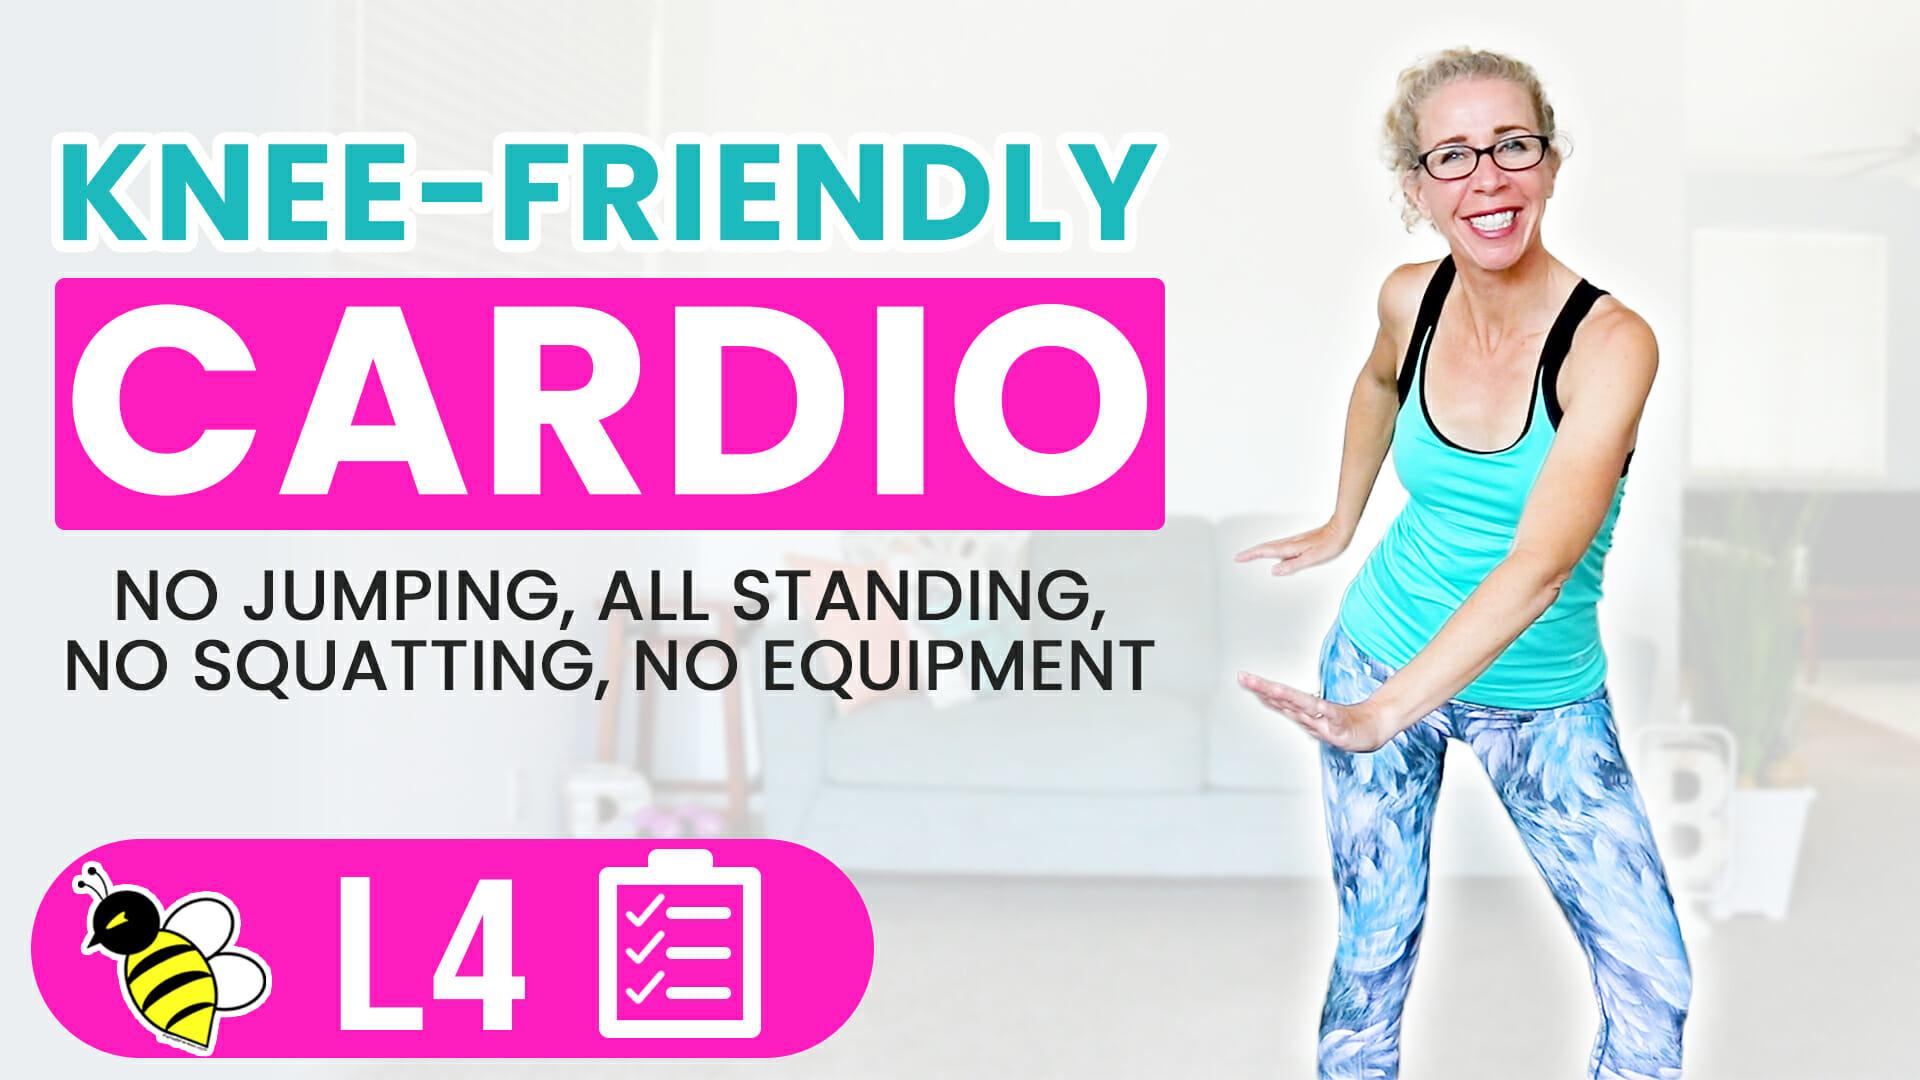 Knee-Friendly Cardio 40 Minute LOW IMPACT Workout Burn 400 Calories